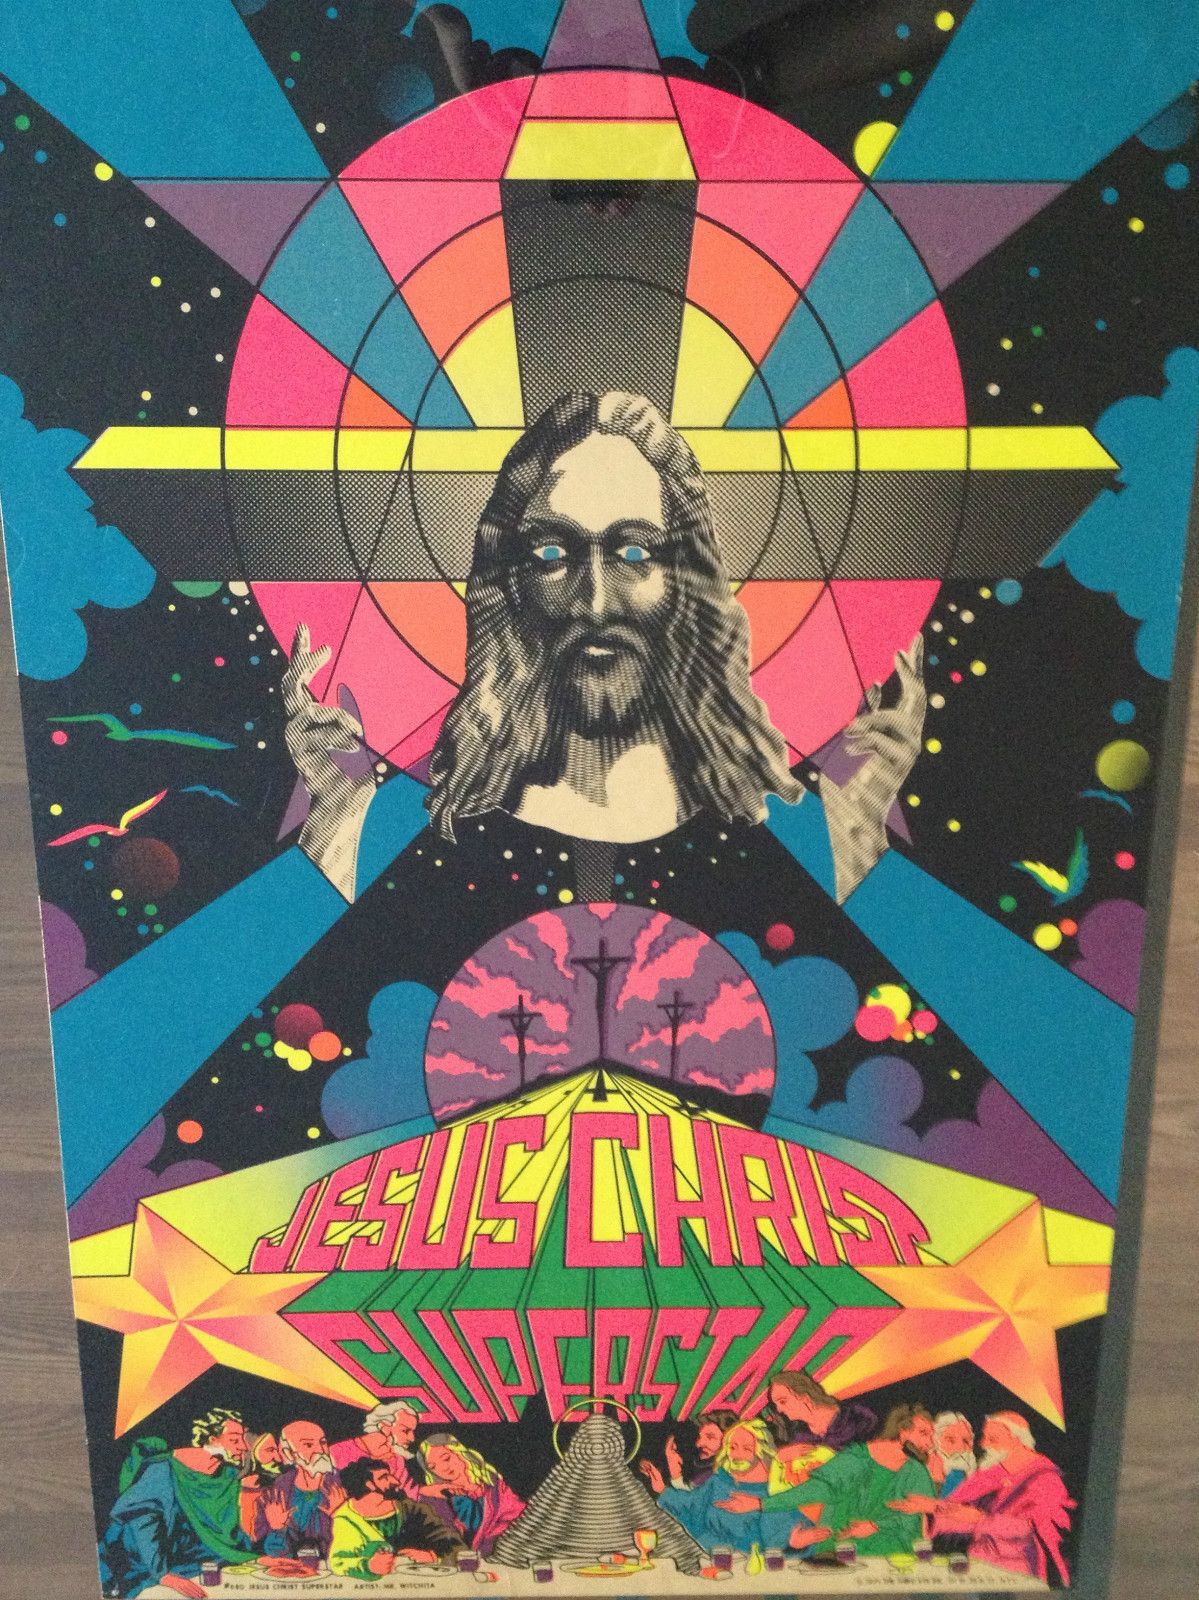 Vintage Black Light Poster Jesus Christ Superstar Third Eye Inc. Psychedelic 70s | eBay